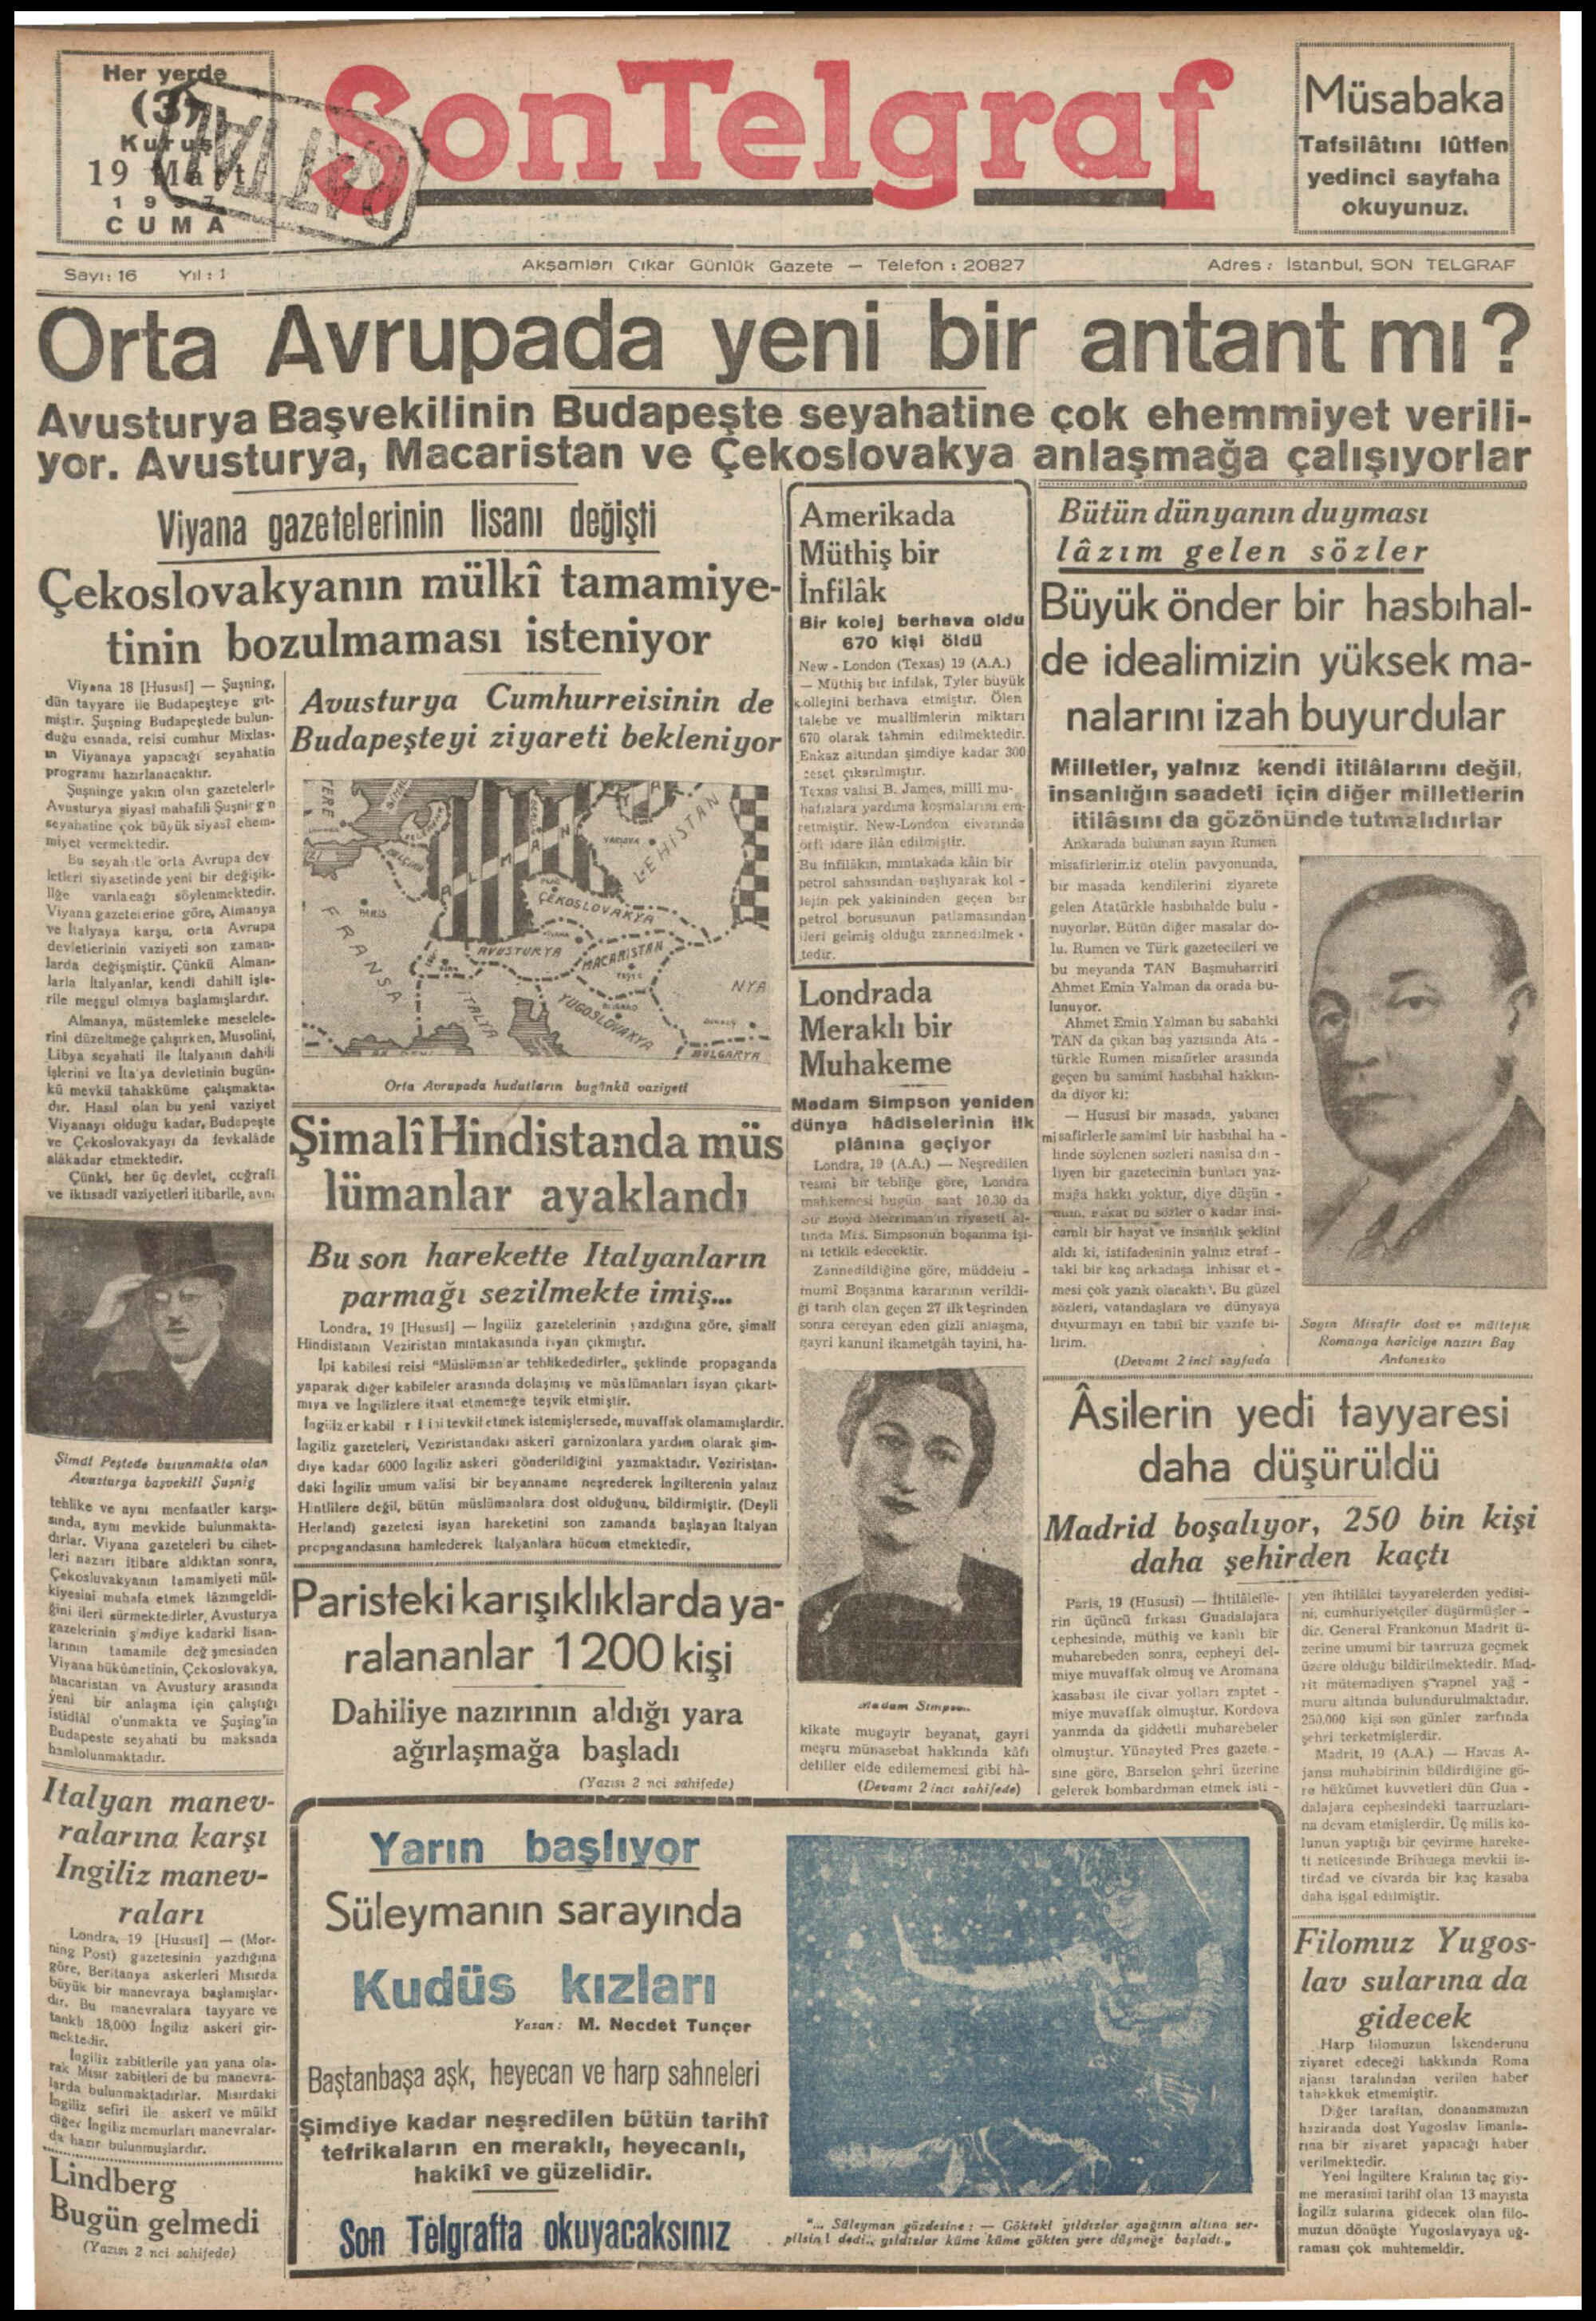 19 Mart 1937 Tarihli Son Telgraf Gazetesi Sayfa 1